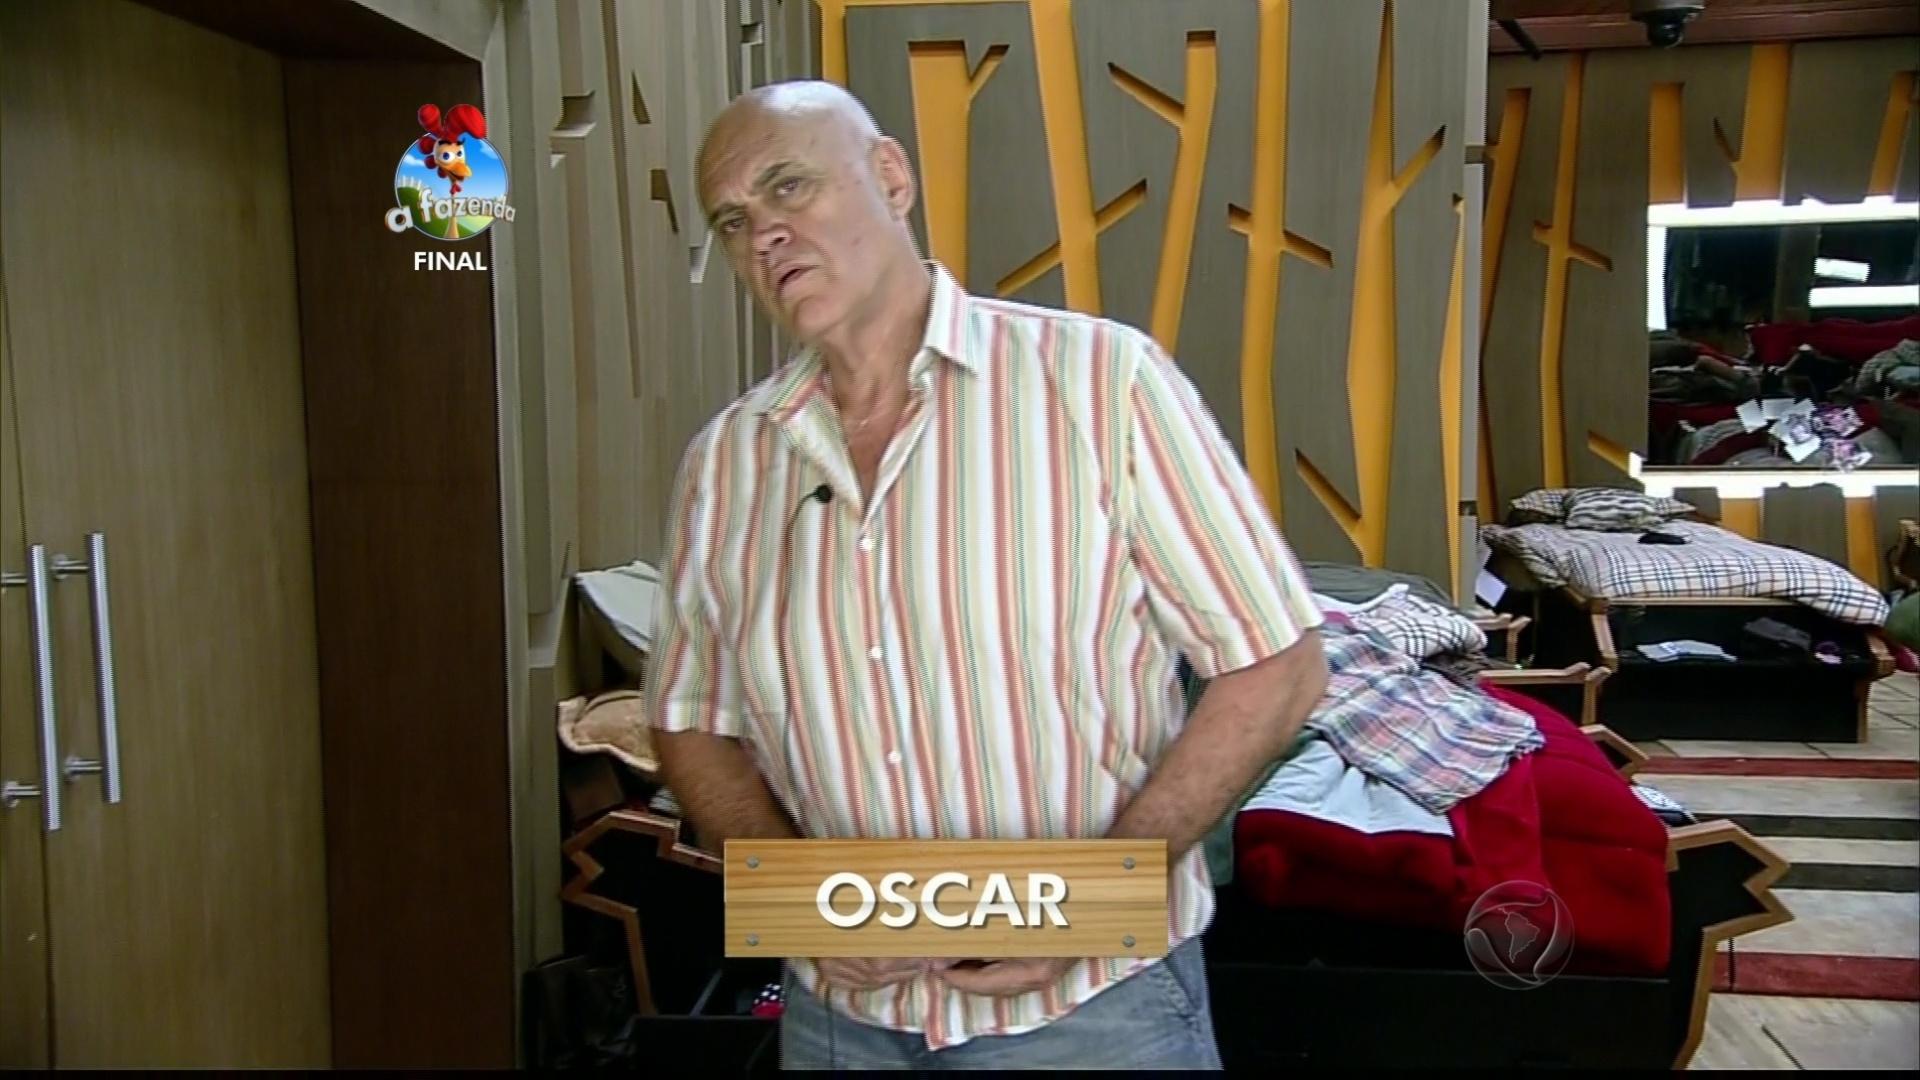 10.dez.2014 - Oscar Maroni é candidato ao posto de maior galã da Fazenda